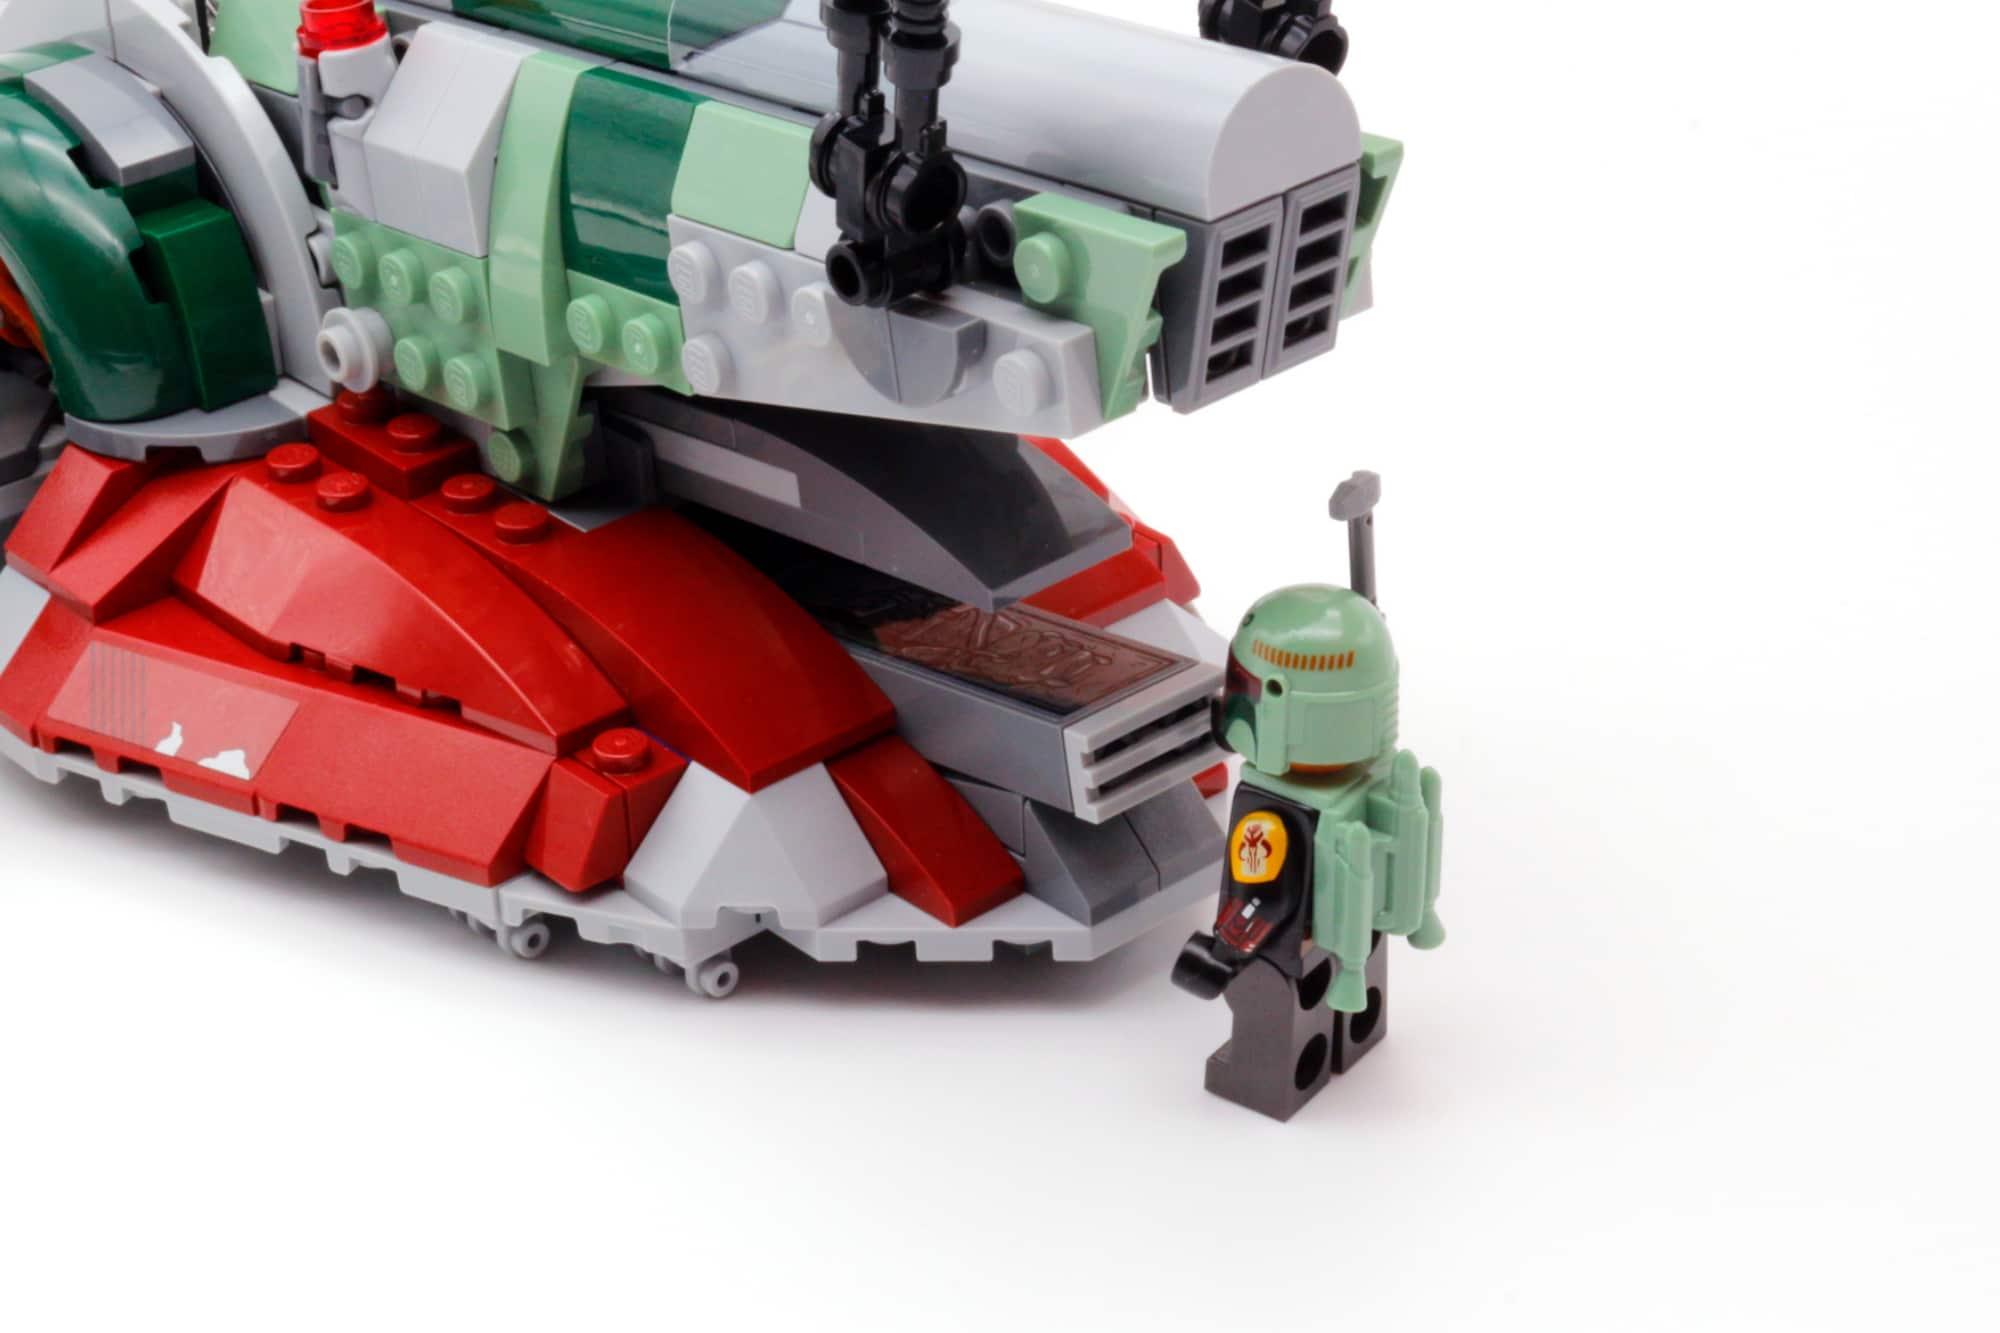 LEGO Star Wars 75312 Boba Fetts Starship 30a